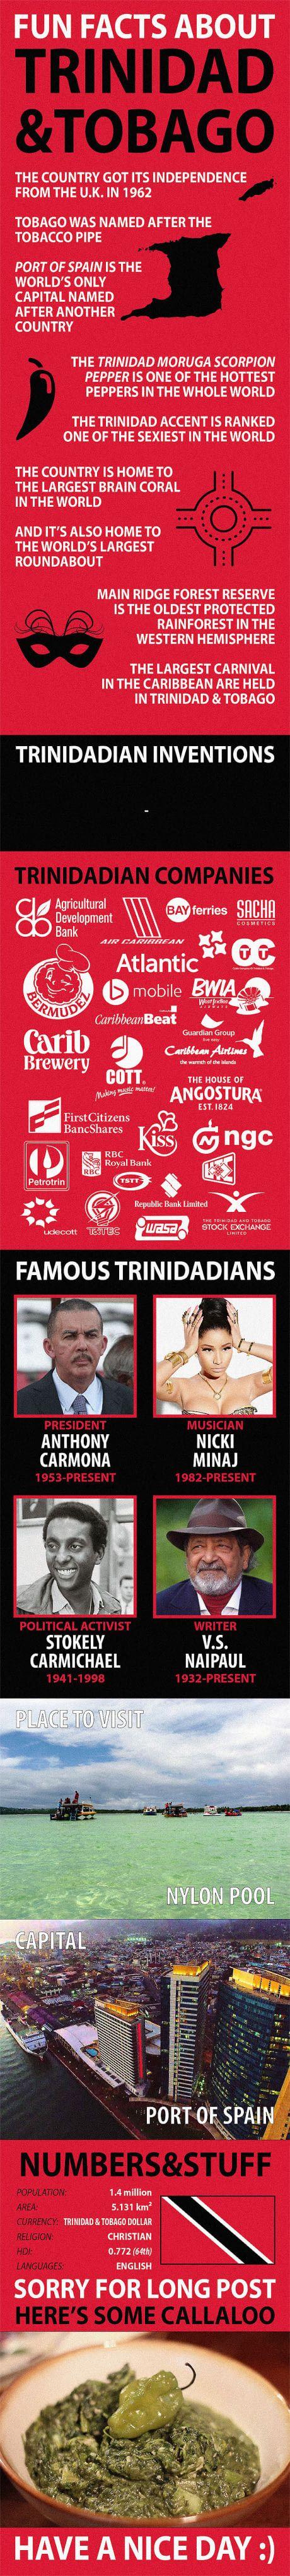 Fun Facts about Trinidad and Tobago